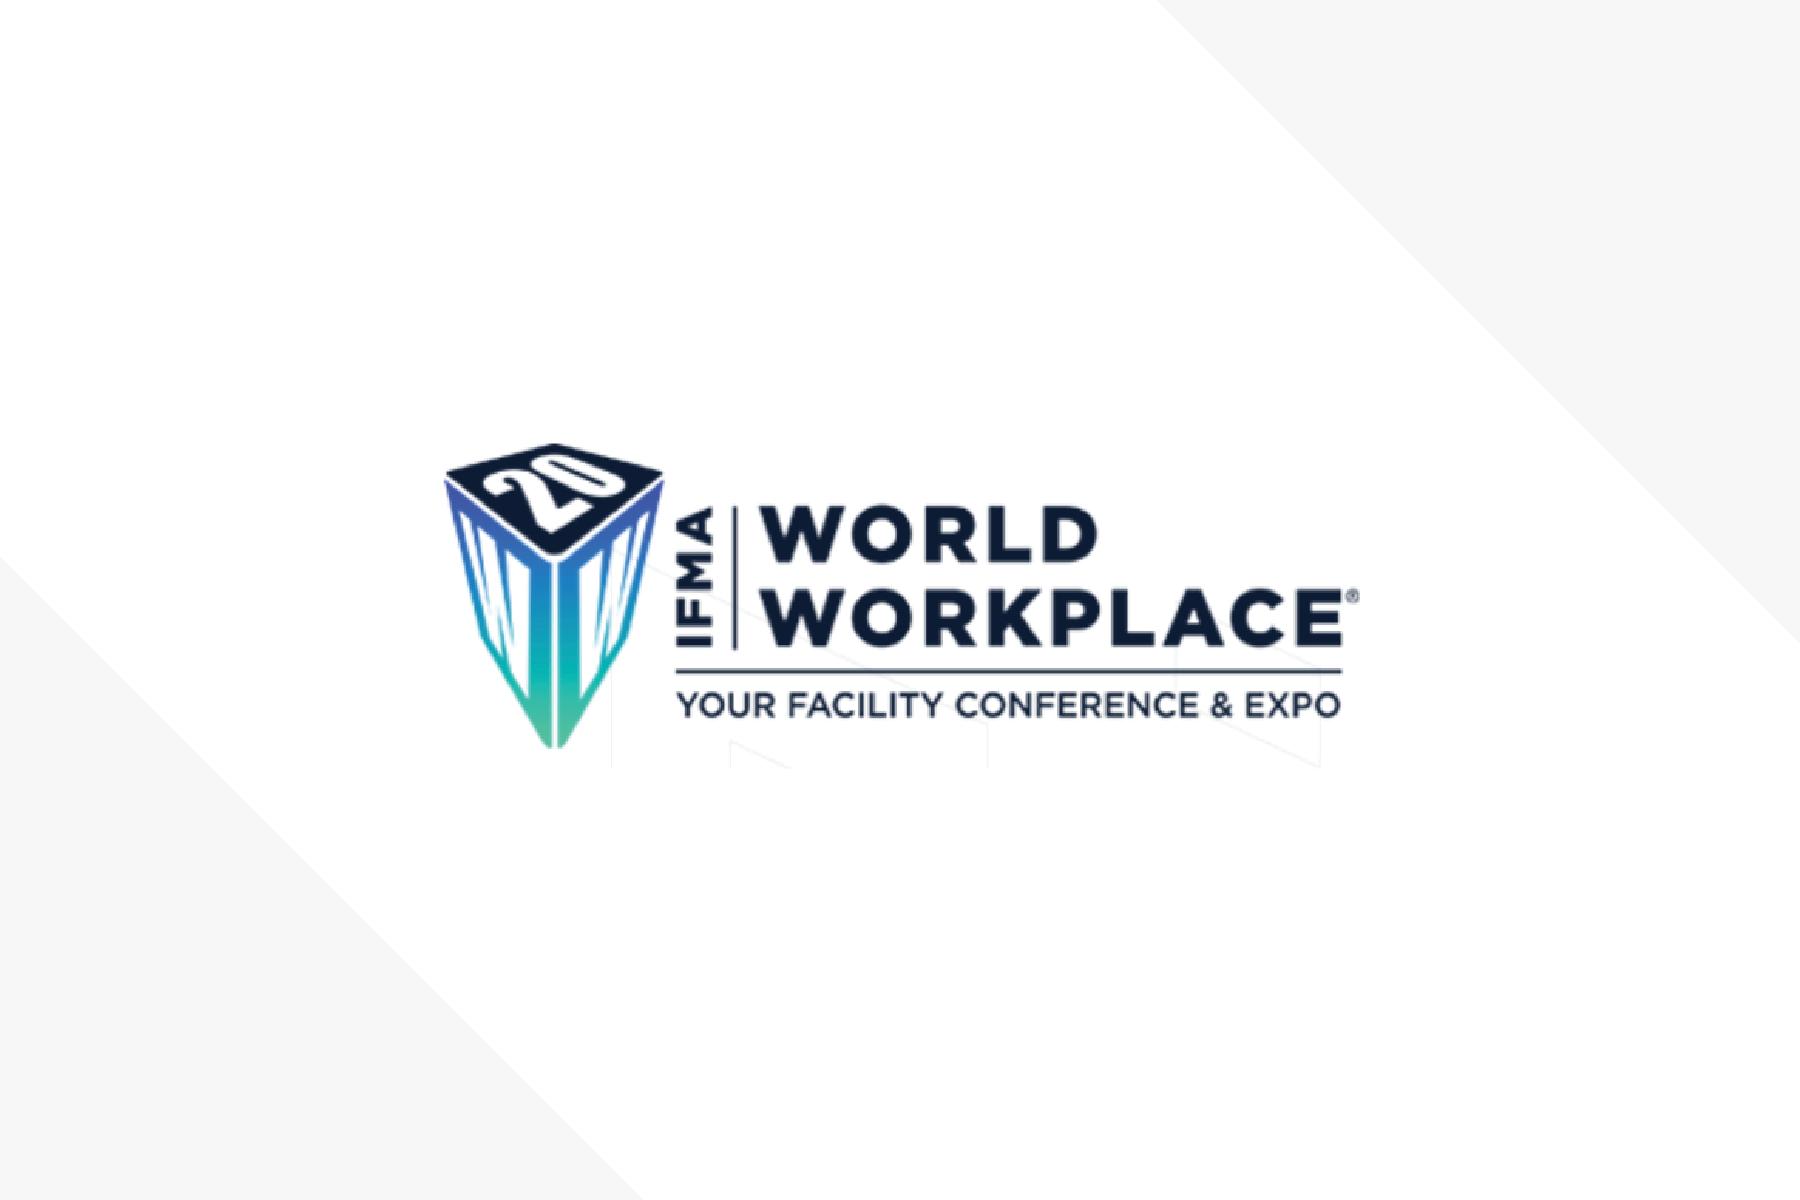 IFMA World Workplace